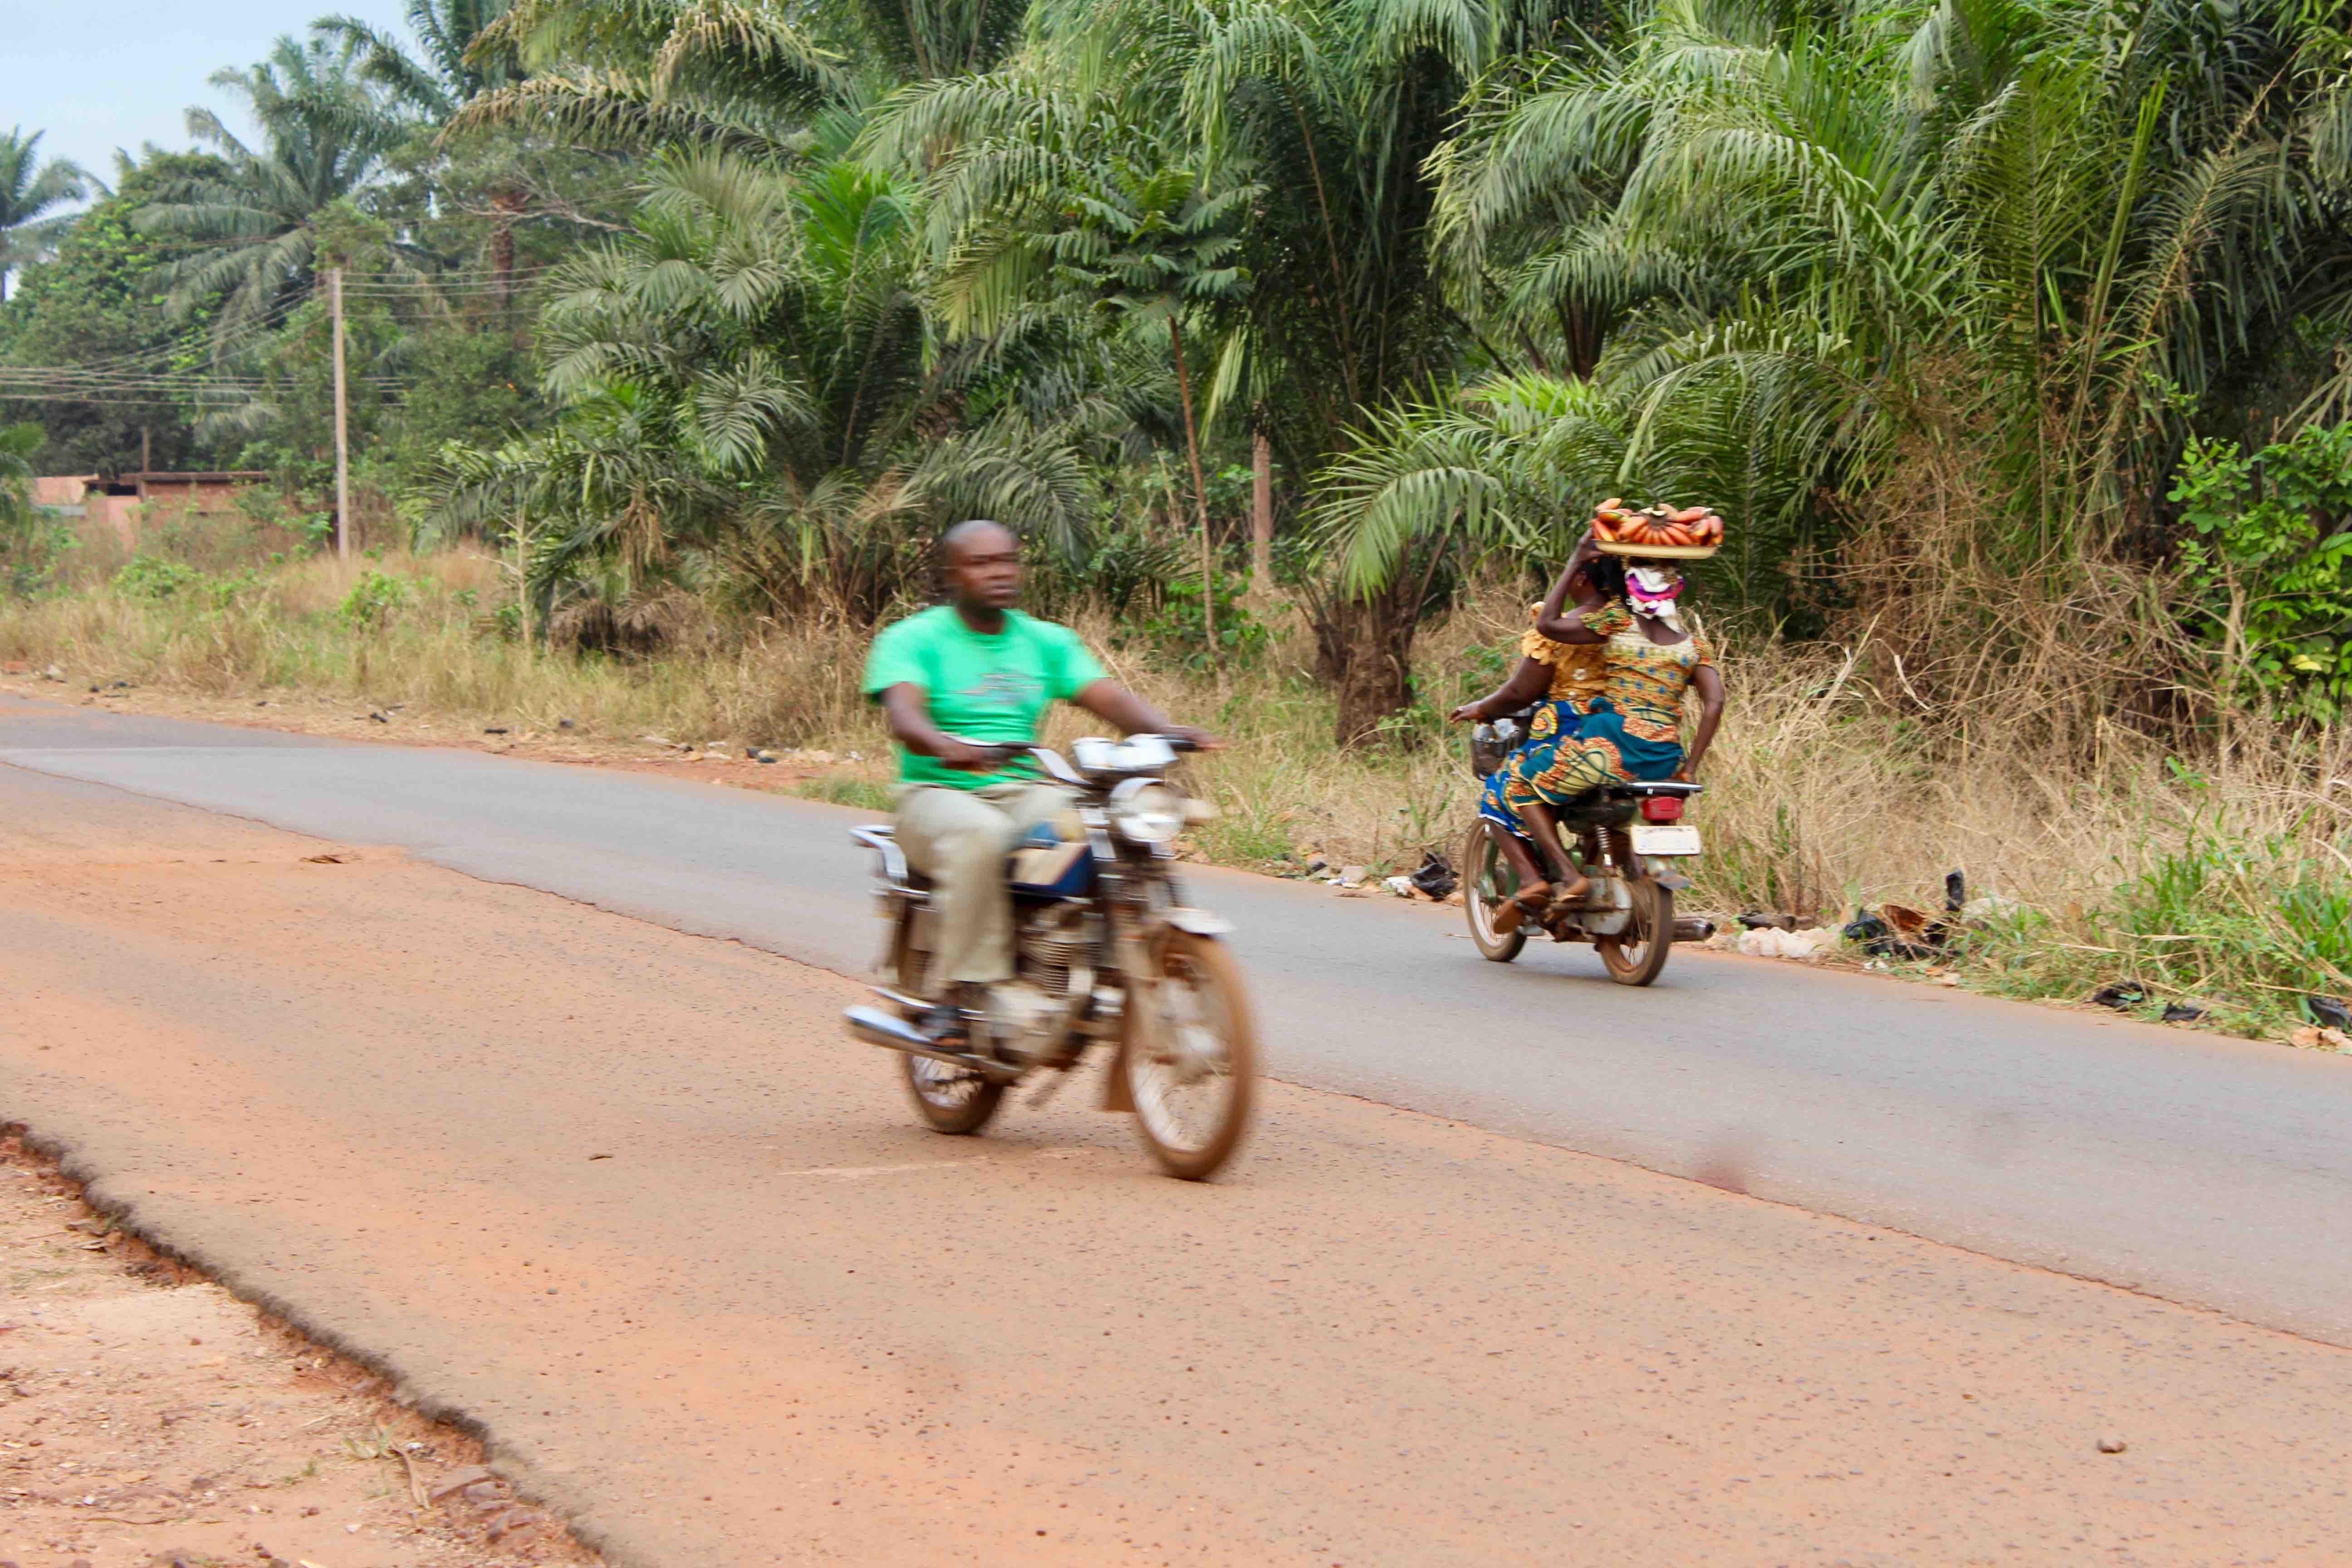 Igbo women and man, motorcycling, Obolo Village, Enugu State, Nigeria. #JujuFilms